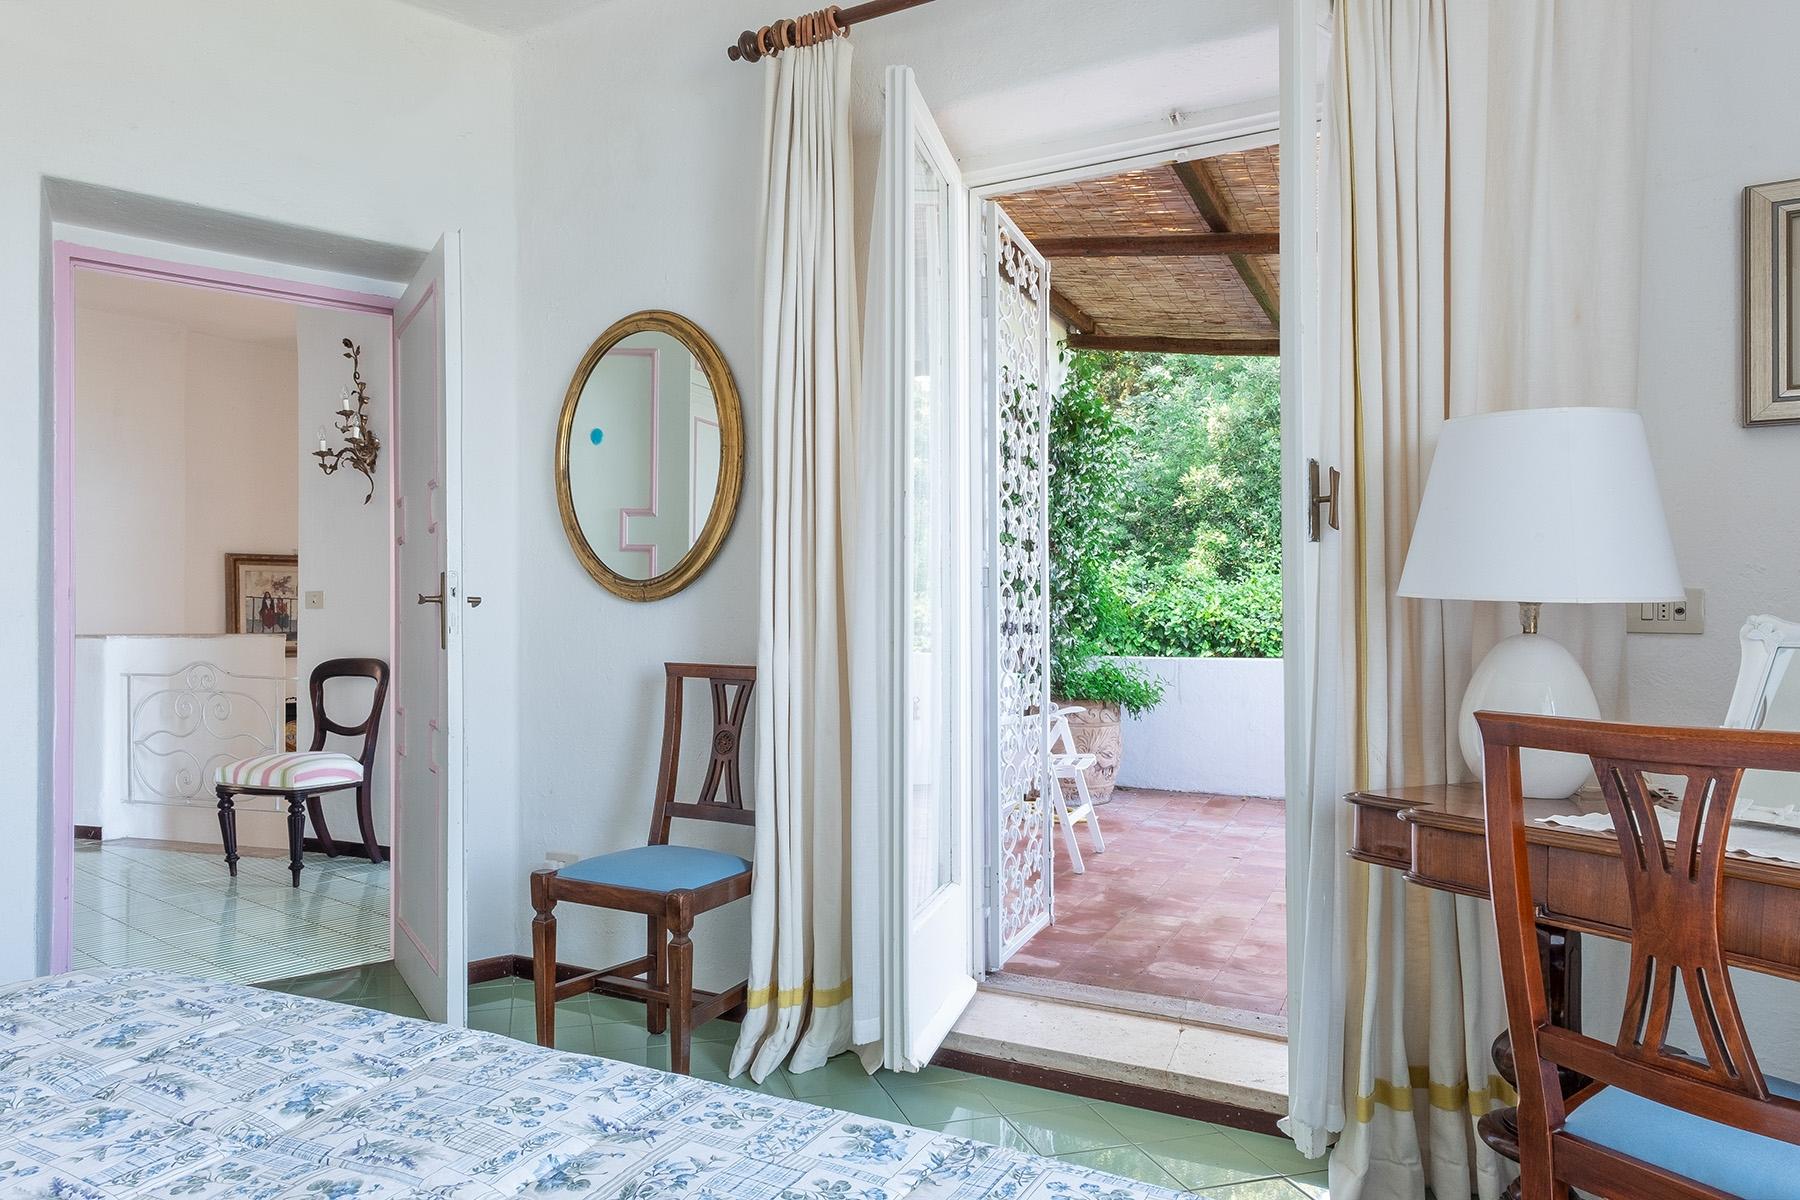 Villa in Vendita a Ischia: 5 locali, 206 mq - Foto 13